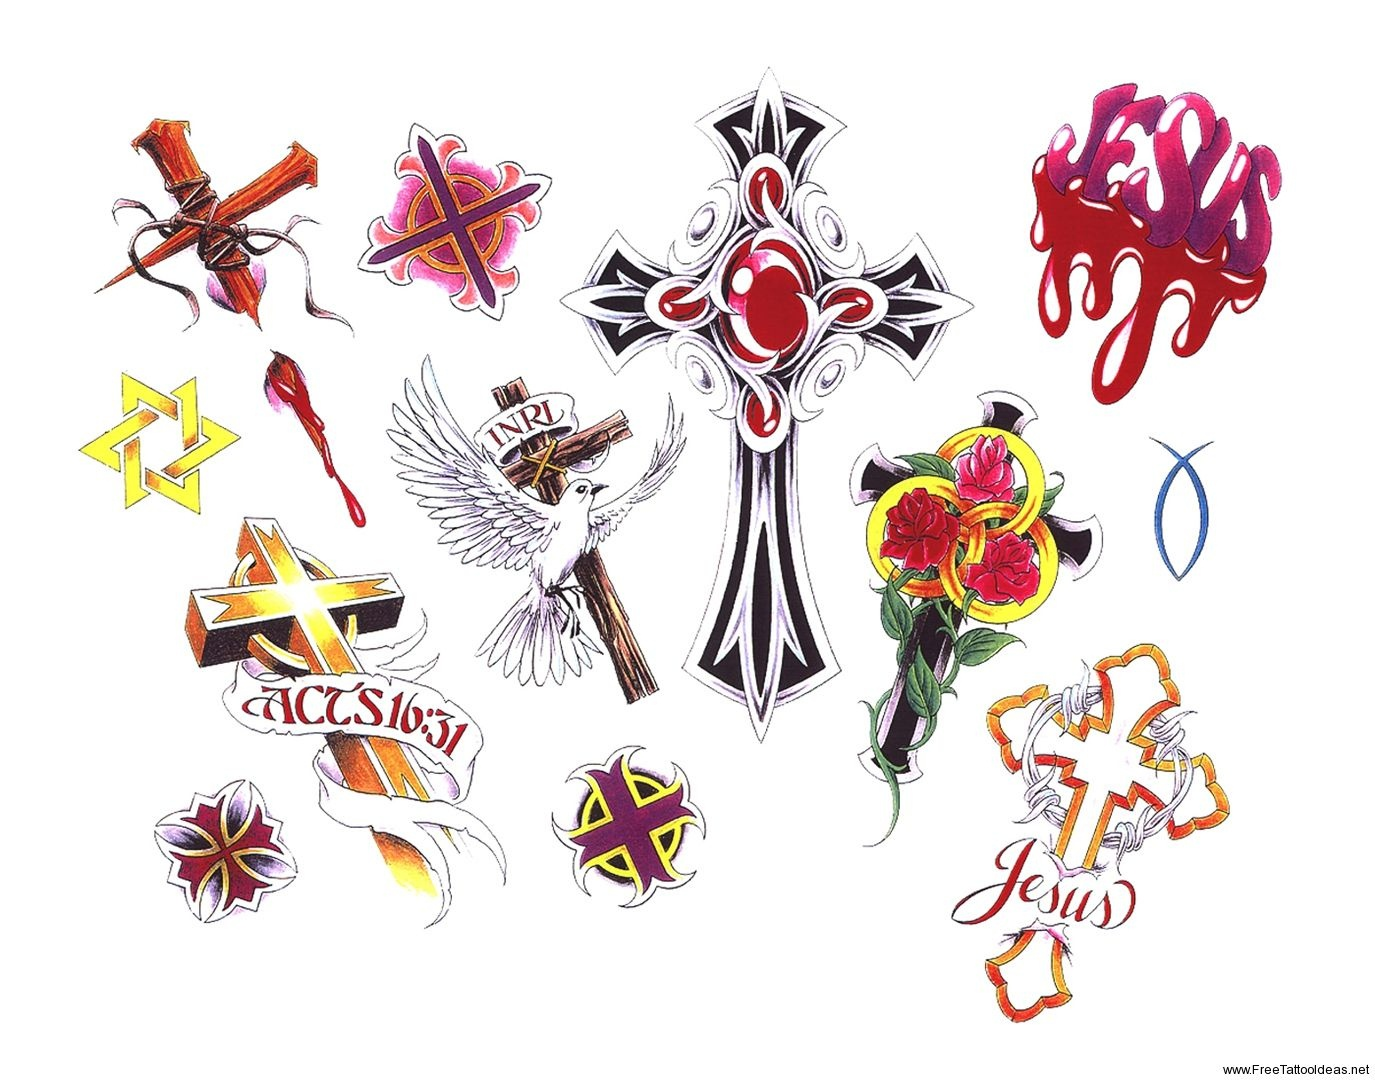 Free Printable Tattoo Flash | Cross Tattoos Designs - Free Cross - Free Printable Tattoo Flash